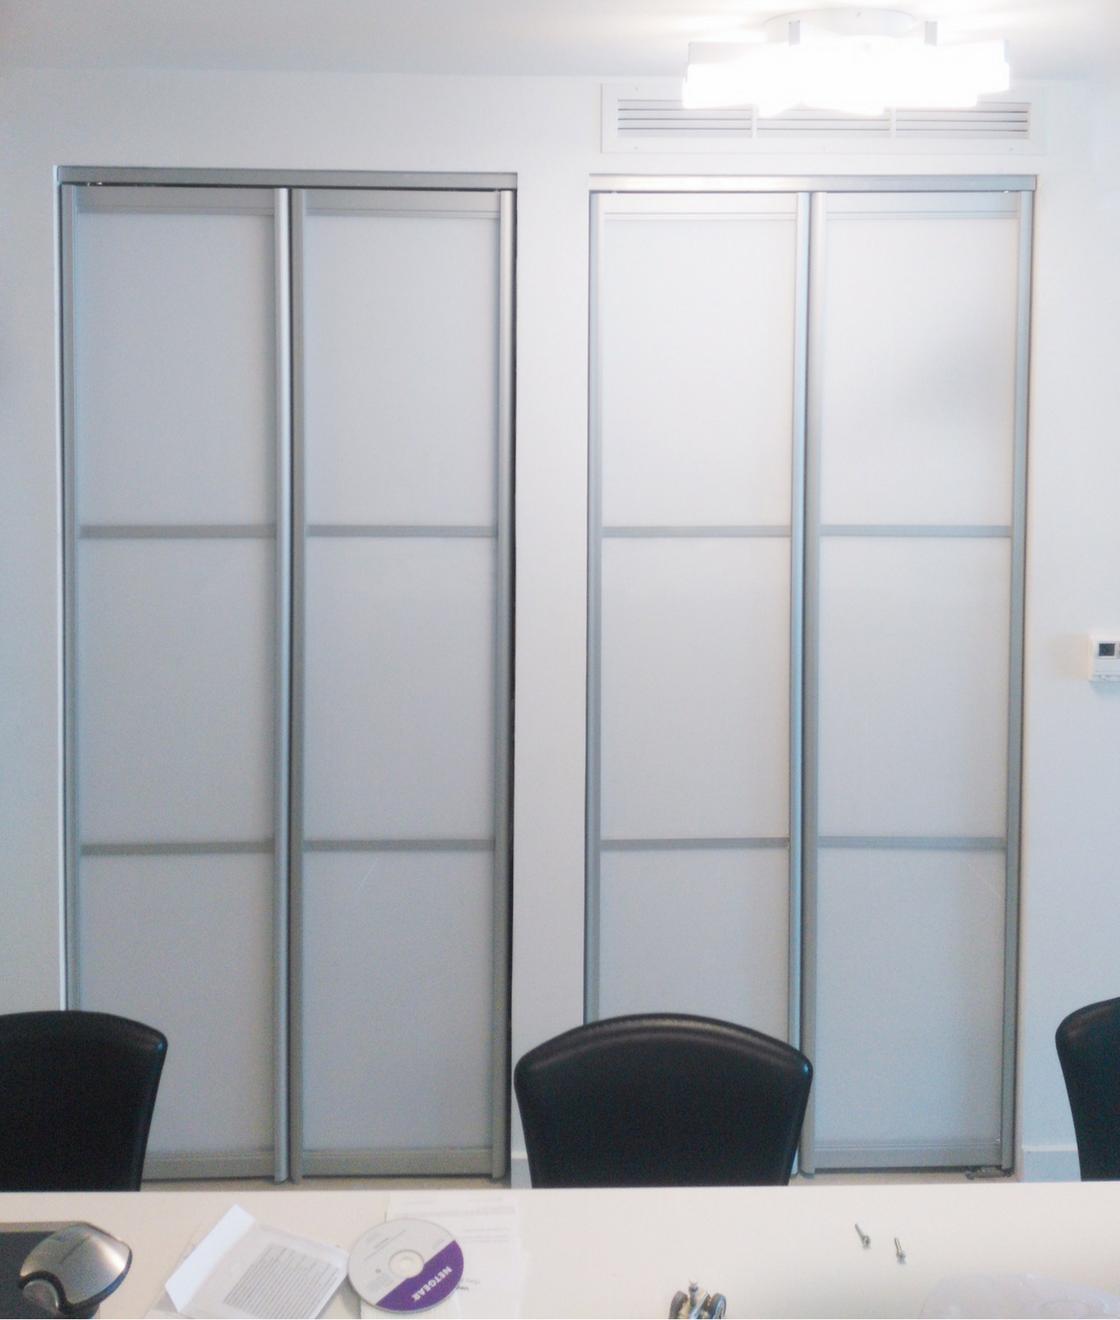 Custom Bifold Closet Doors Snow White Glass Panels And Aluminum Frames Made To Custom Order Clo Custom Bifold Closet Doors Modern Closet Doors Closet Doors